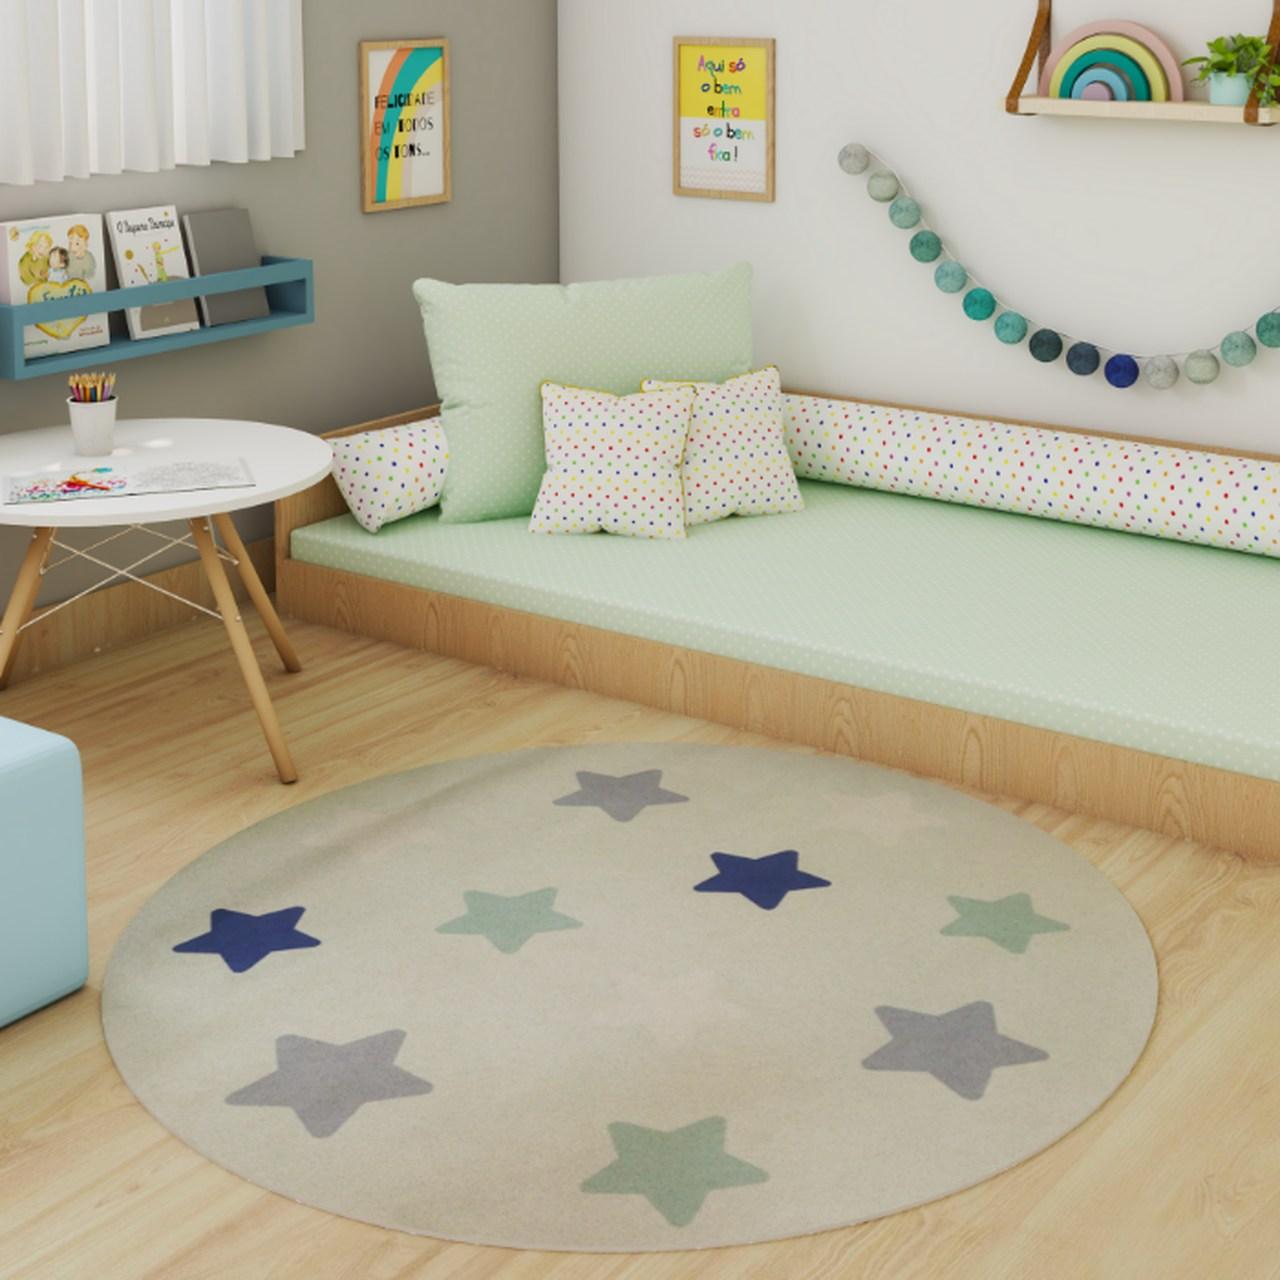 Tapete redondo quarto infantil estampa Estrelas